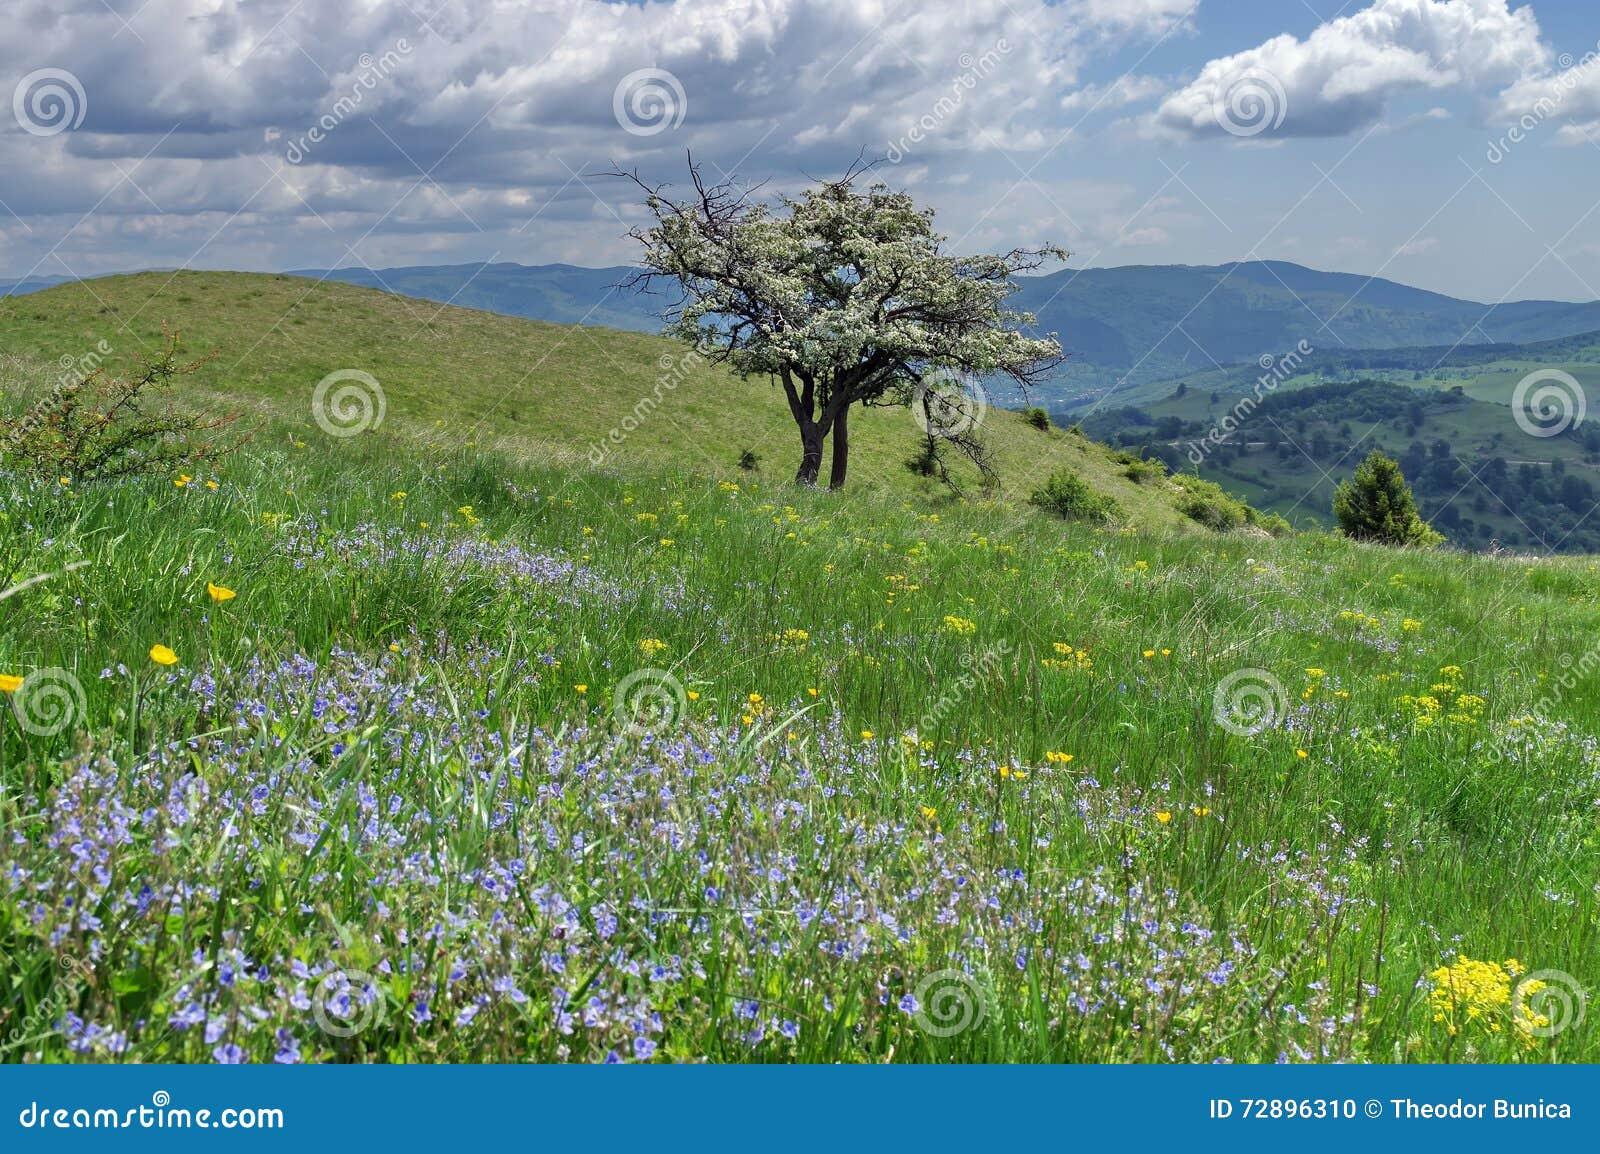 Flowers in meadow. Spring mountain landscape - Baiului Mountains, landmark attraction in Romania